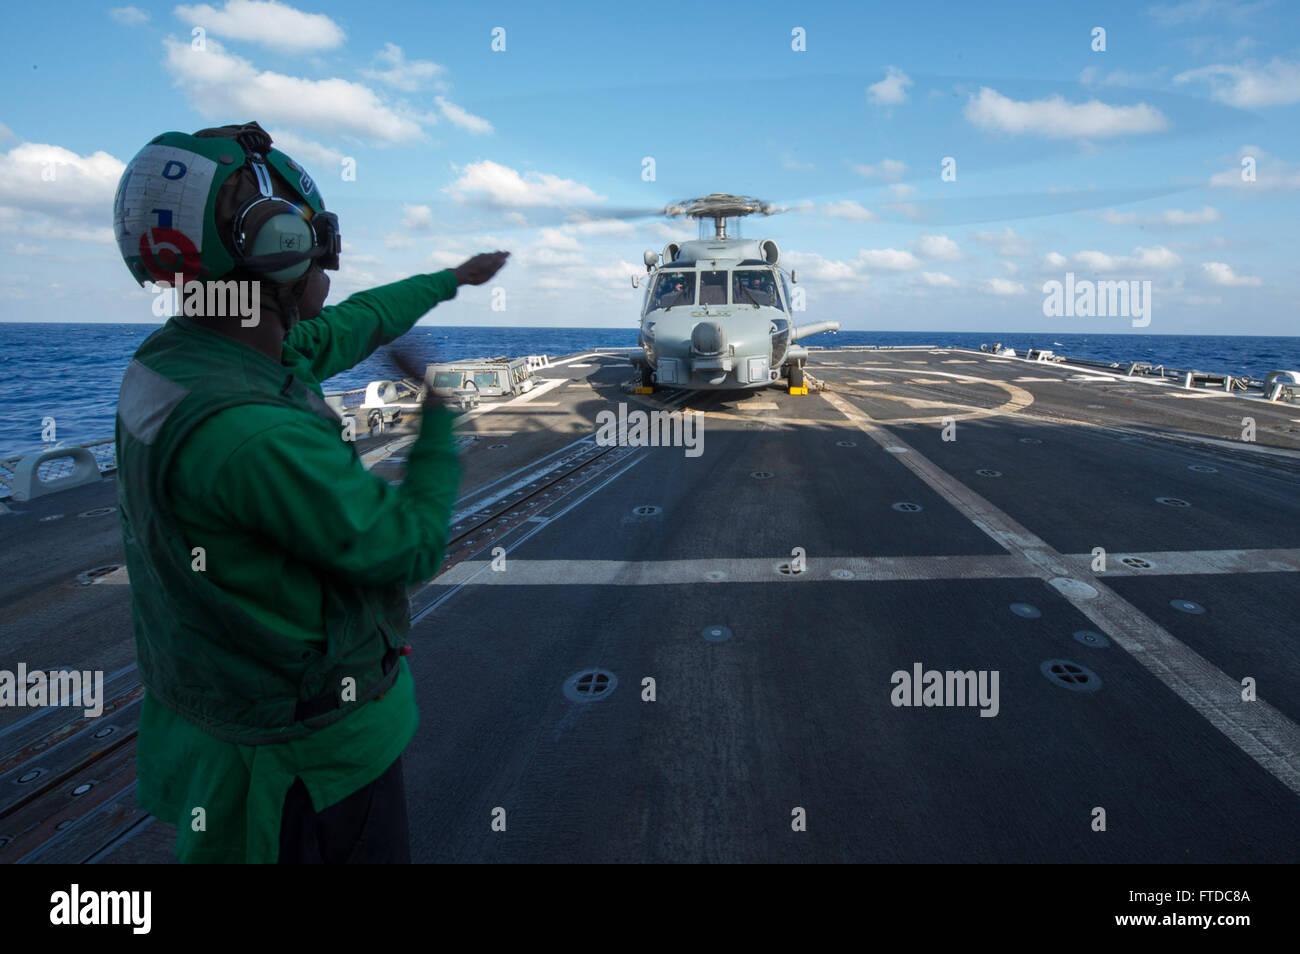 130917-N-NU634-049 MEDITERRANEAN SEA (Sept. 17, 2013) Aviation Electronics Technician 3rd Class Marqueze Coleman, Stock Photo